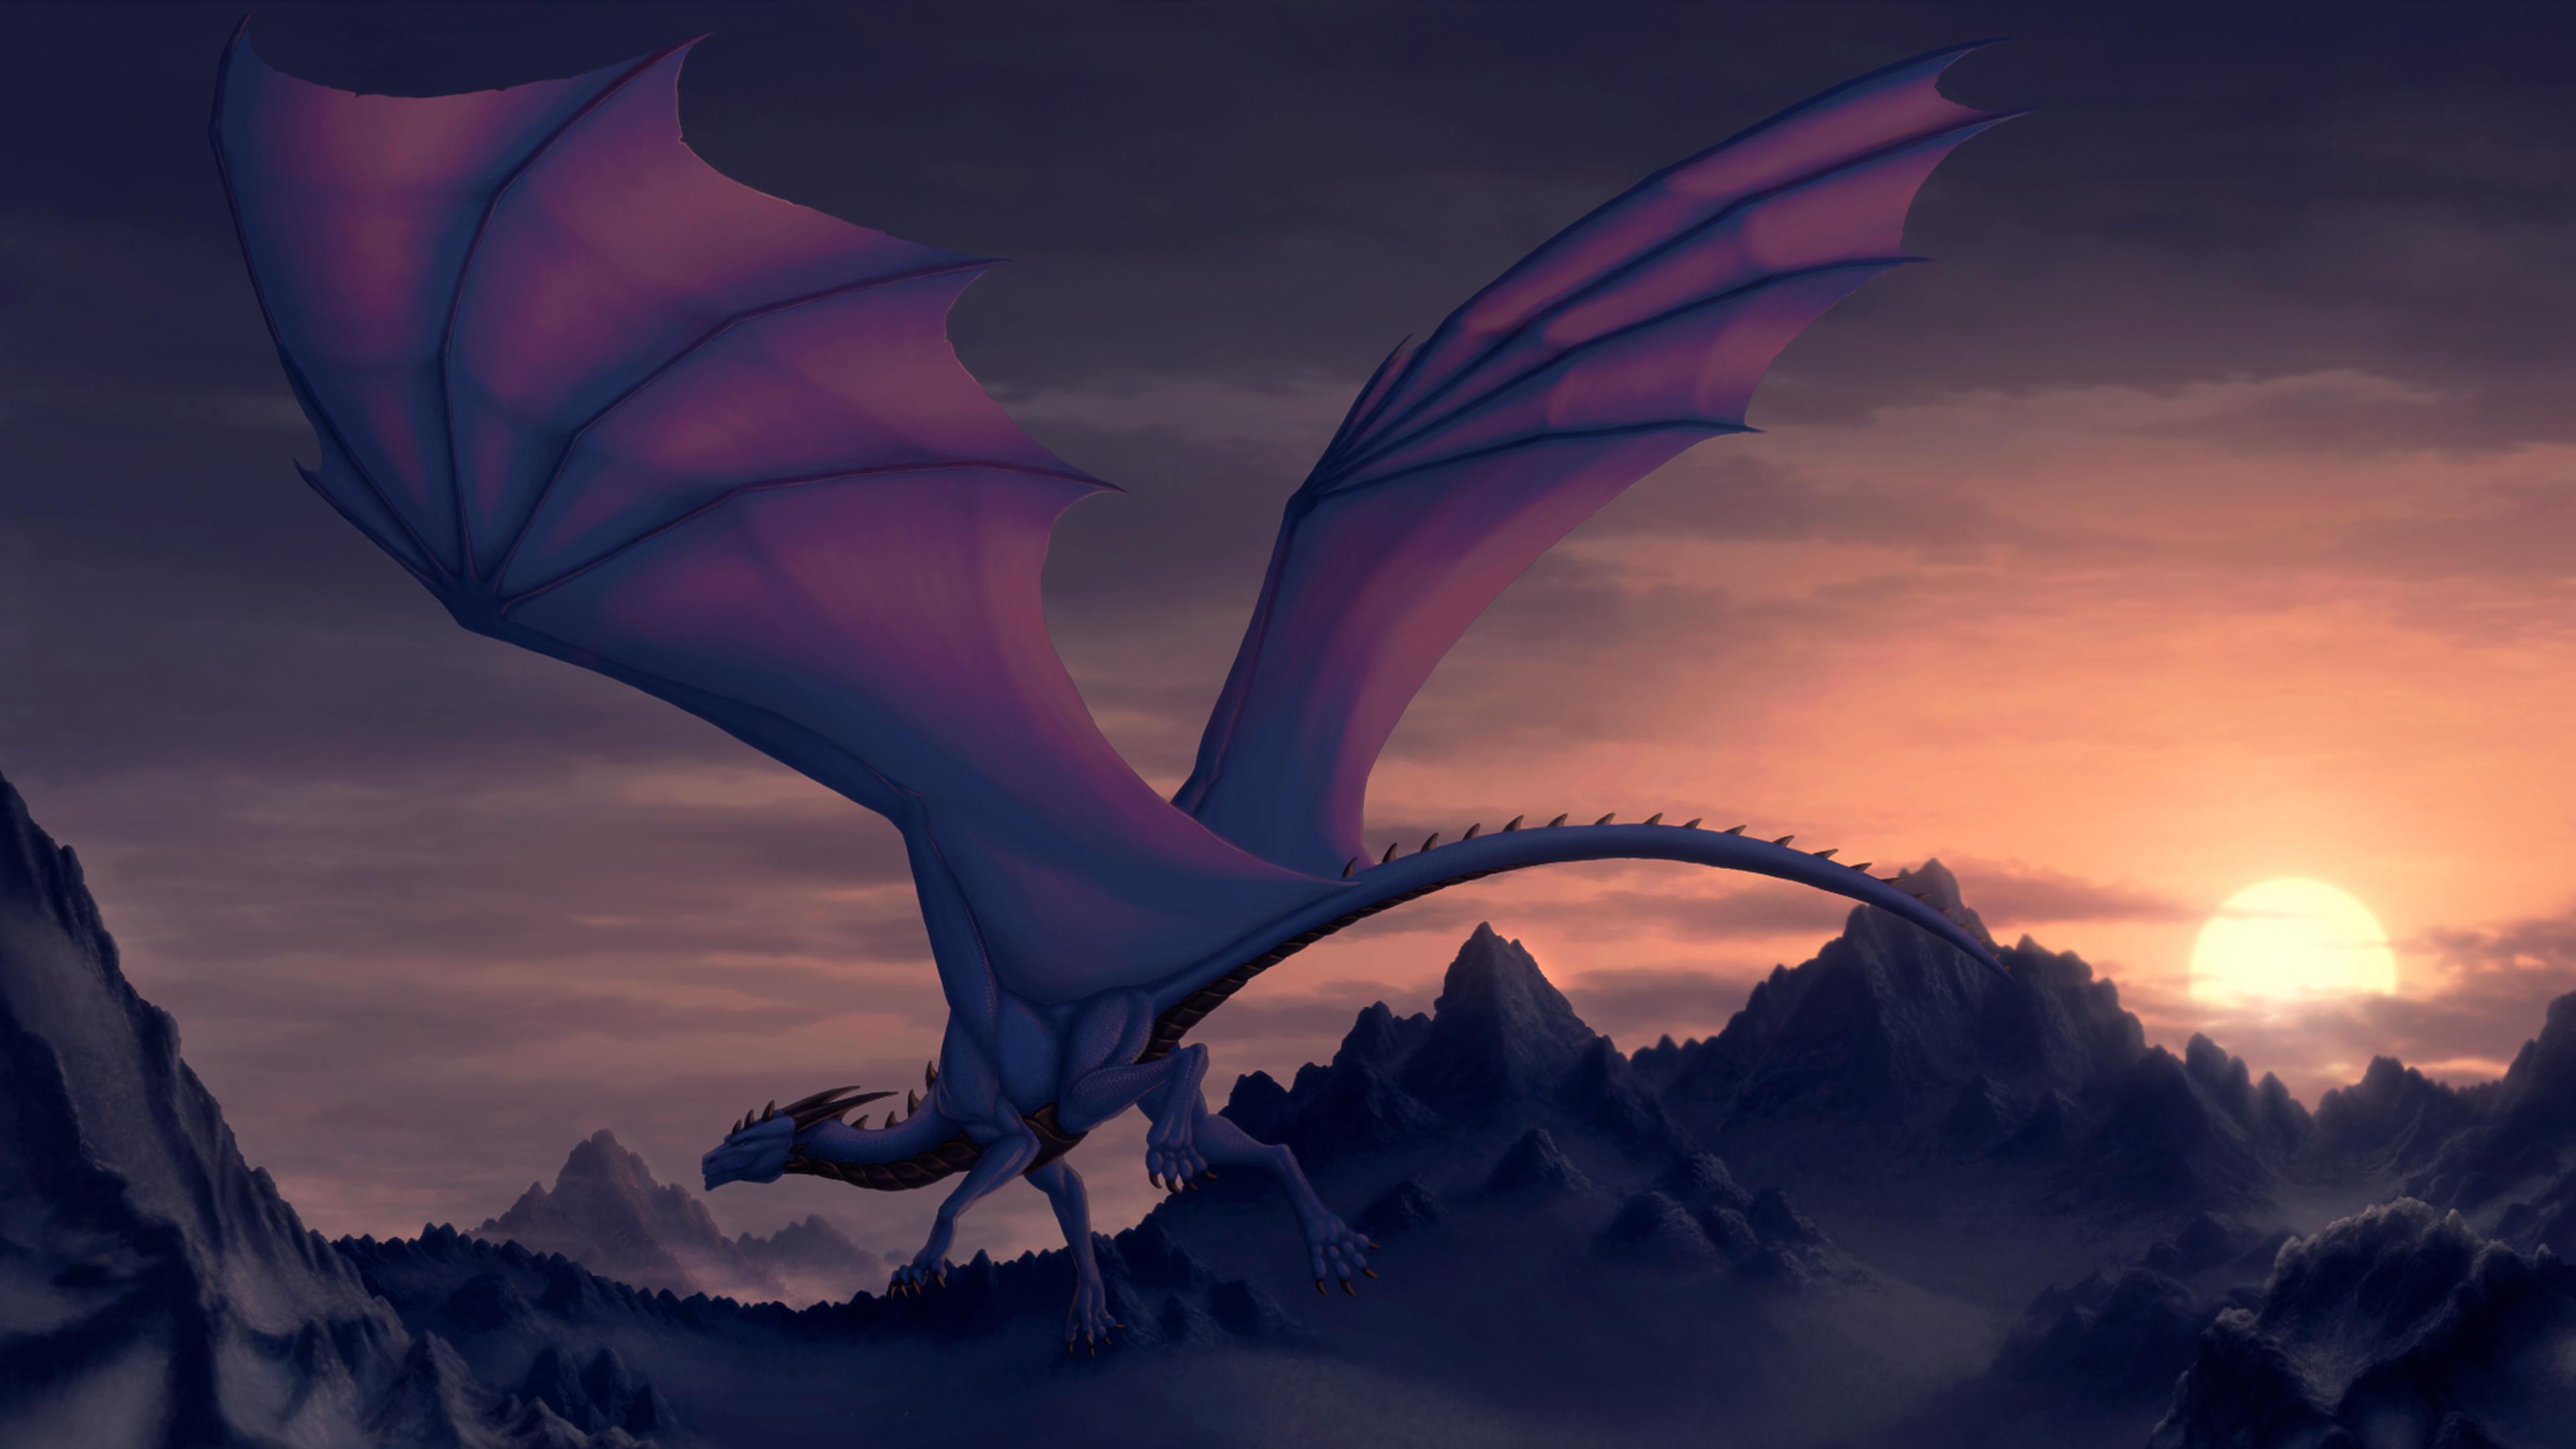 79 Purple Dragon Wallpapers on WallpaperPlay